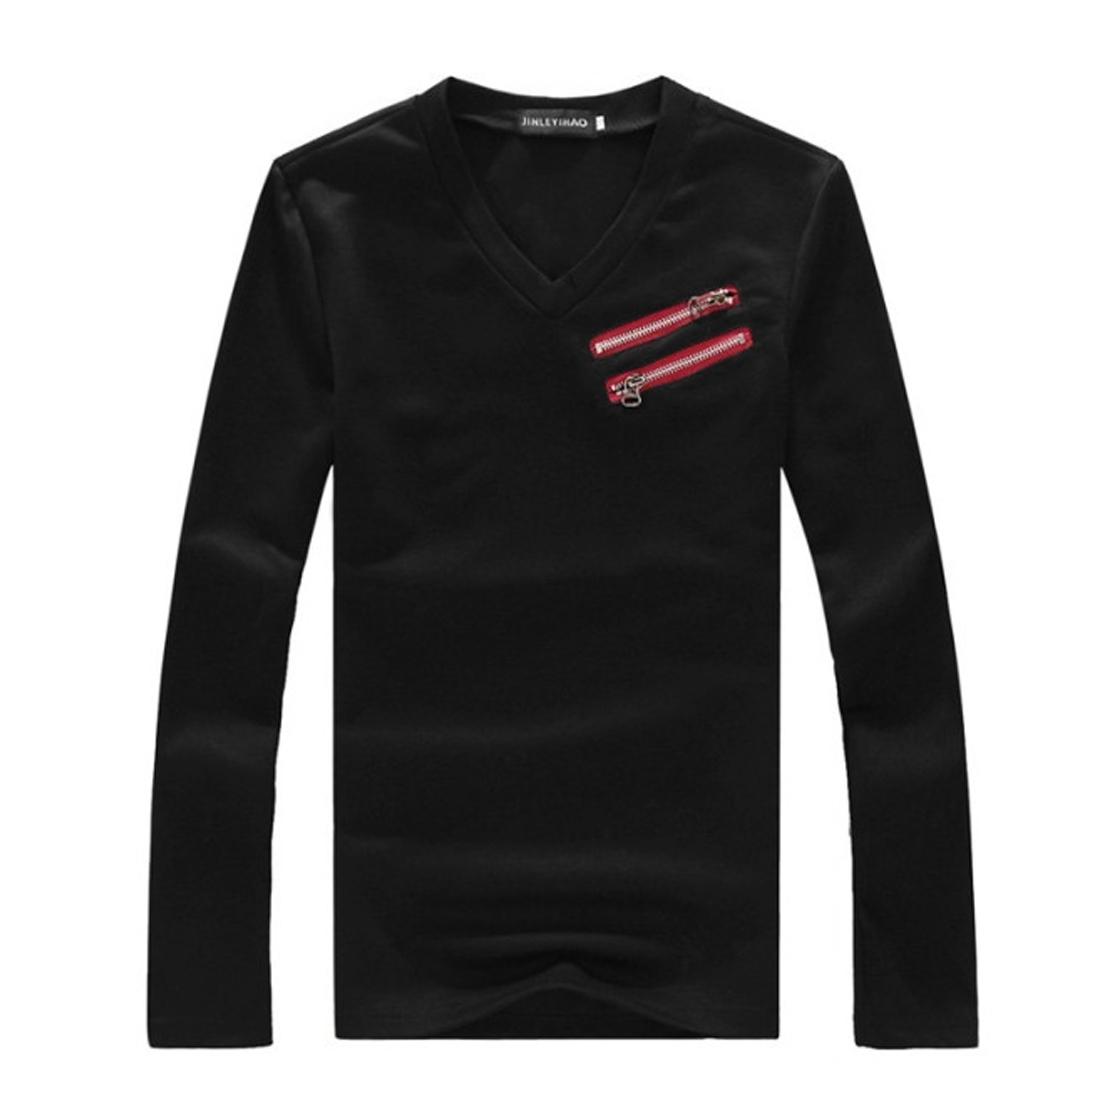 Man New Style V-Neck Long Sleeve Slant Zipper Front Decor Black Shirt S